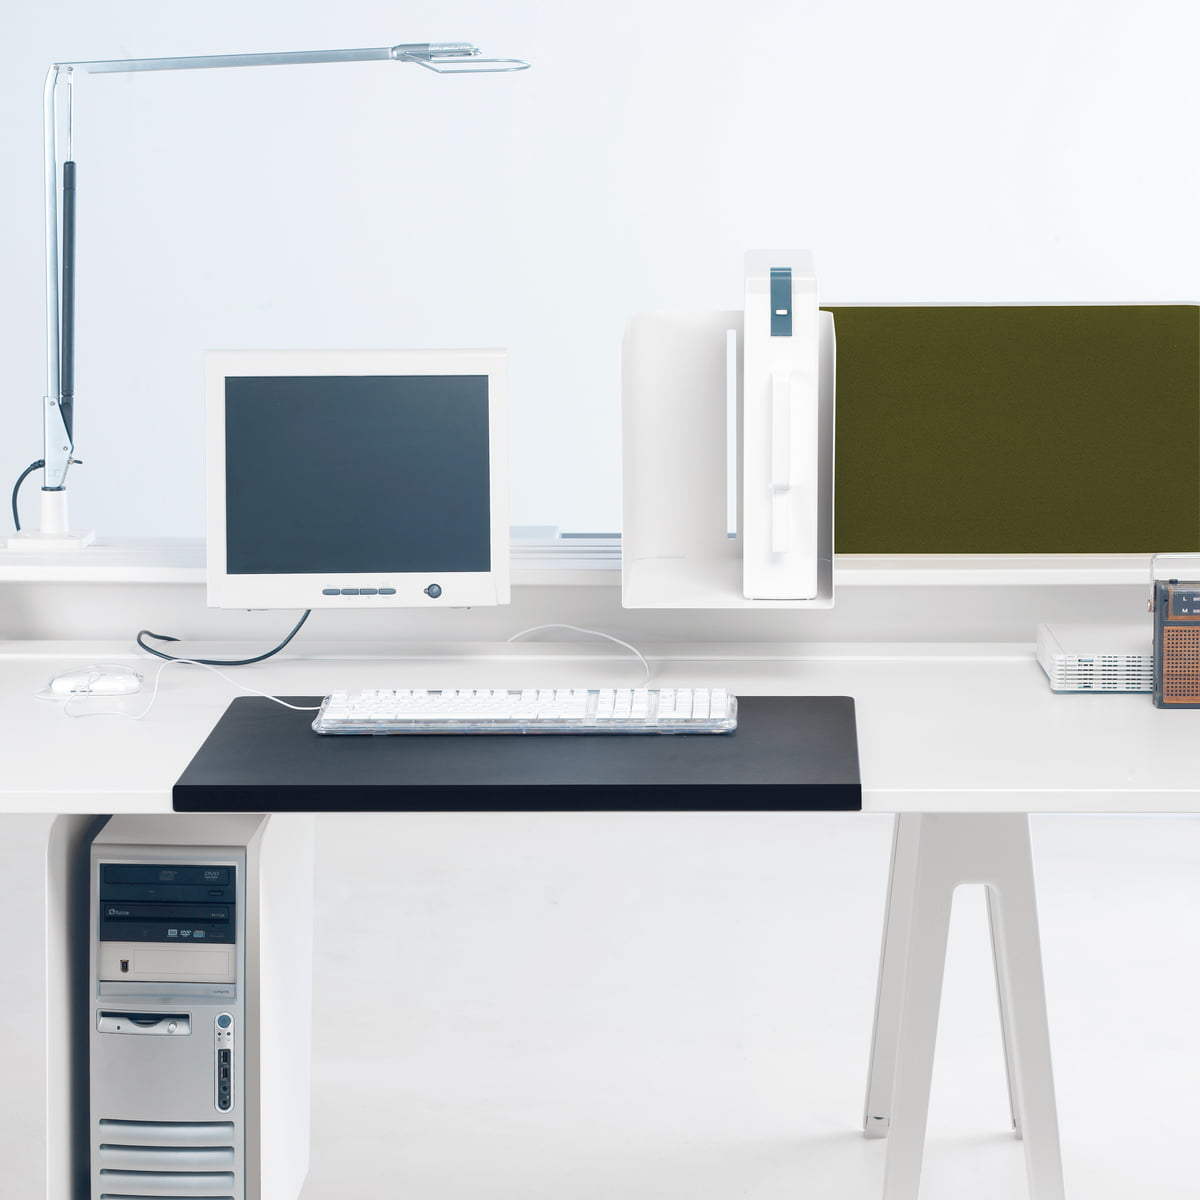 buy front furniture counter detail design shop office desk modern product